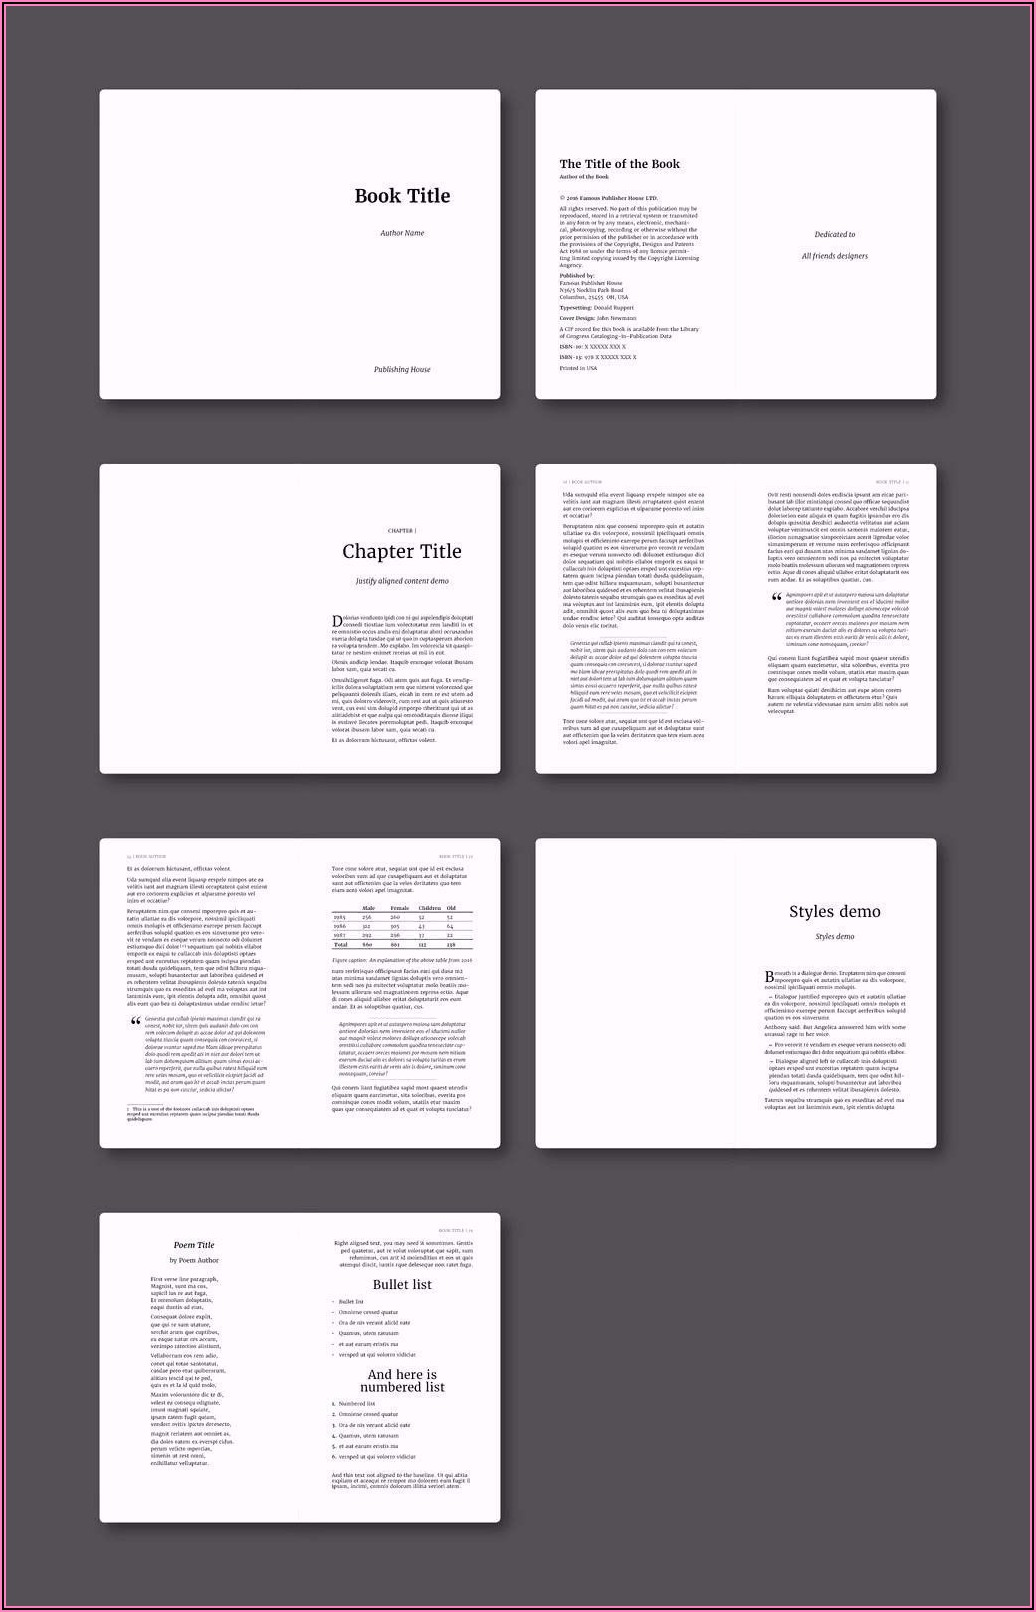 Adobe Indesign Ebook Template